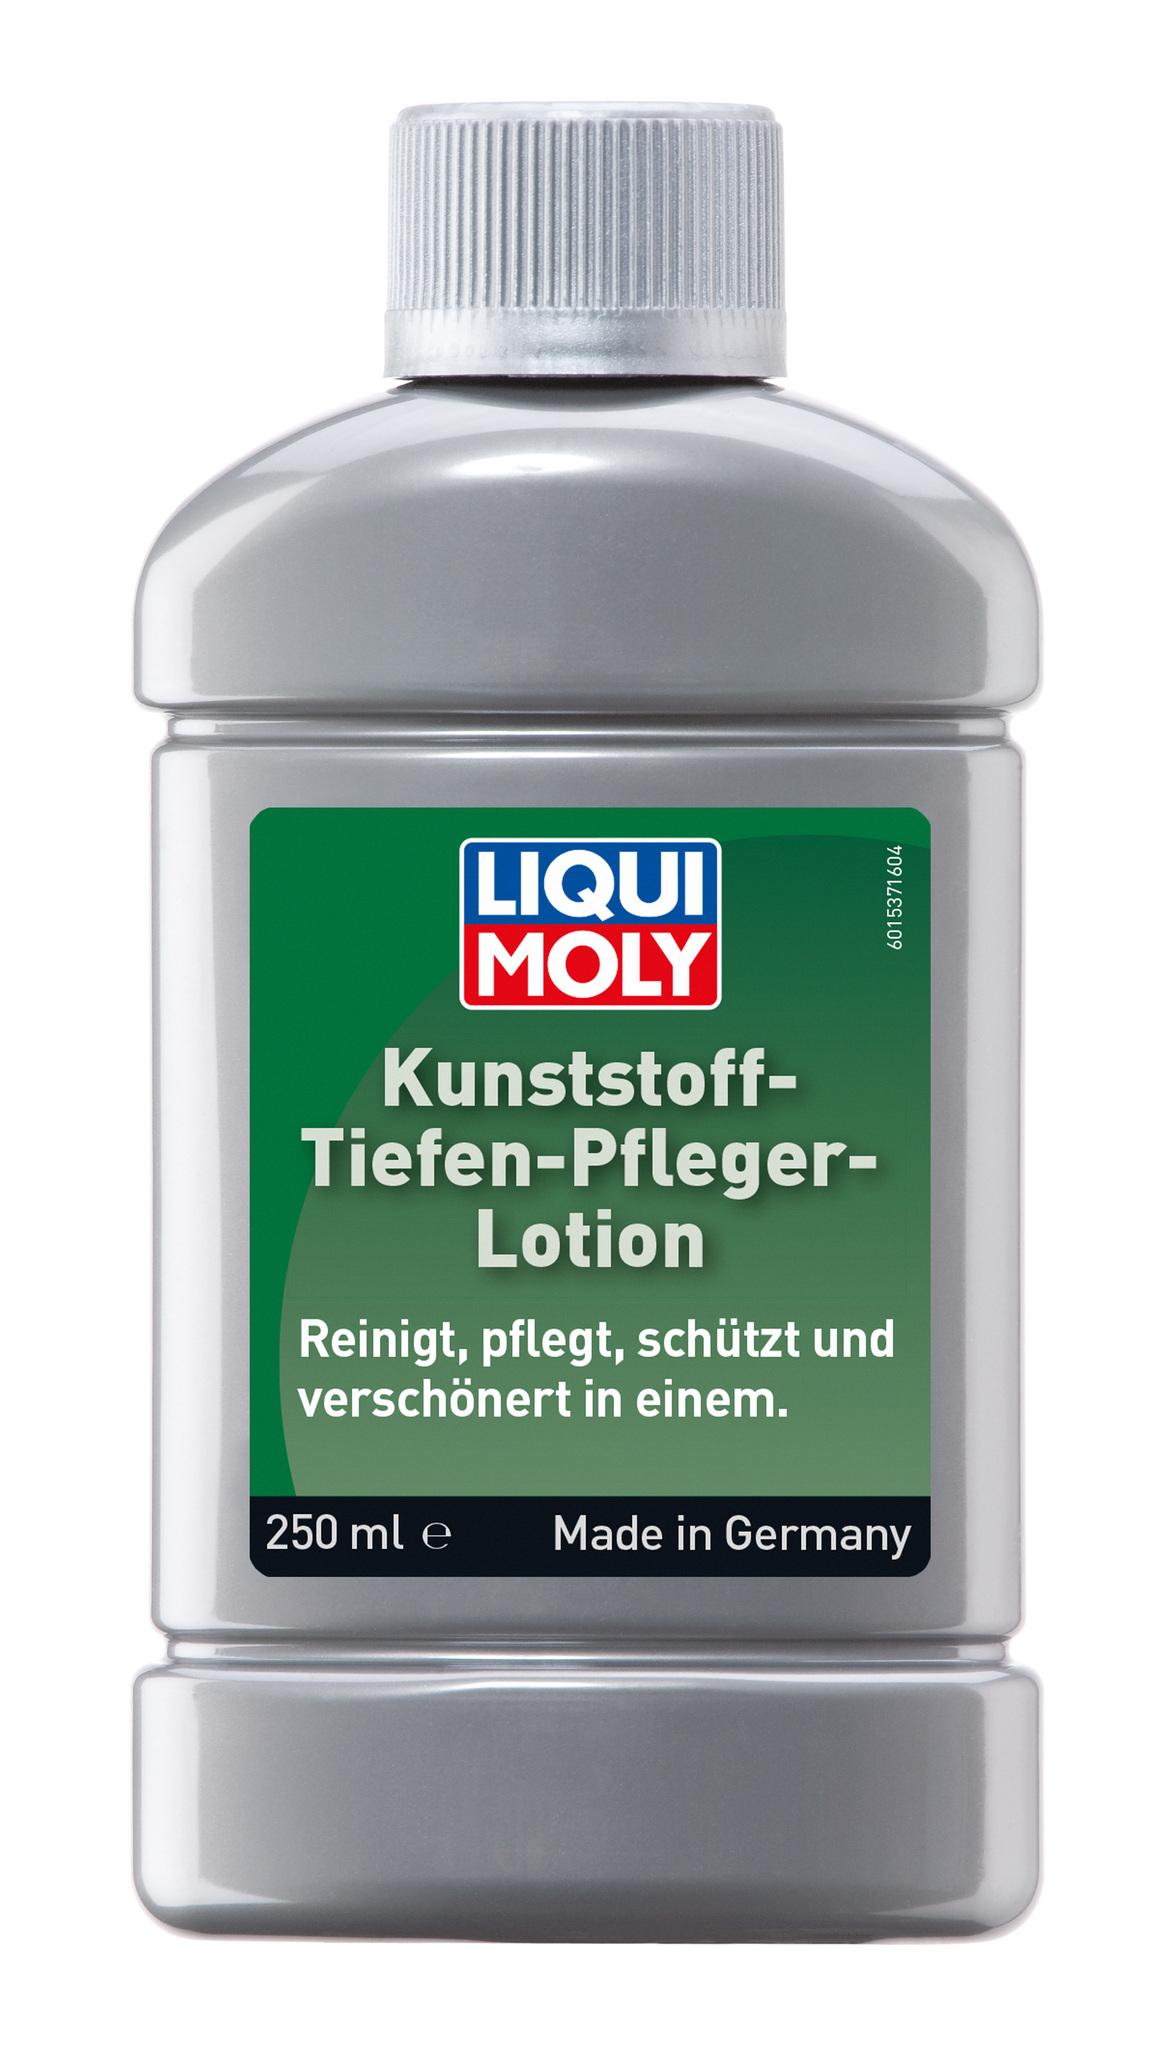 Liqui Moly Kunststoff-Tiefen-Pfleger-Lotion  Лосьон для ухода за пластиком